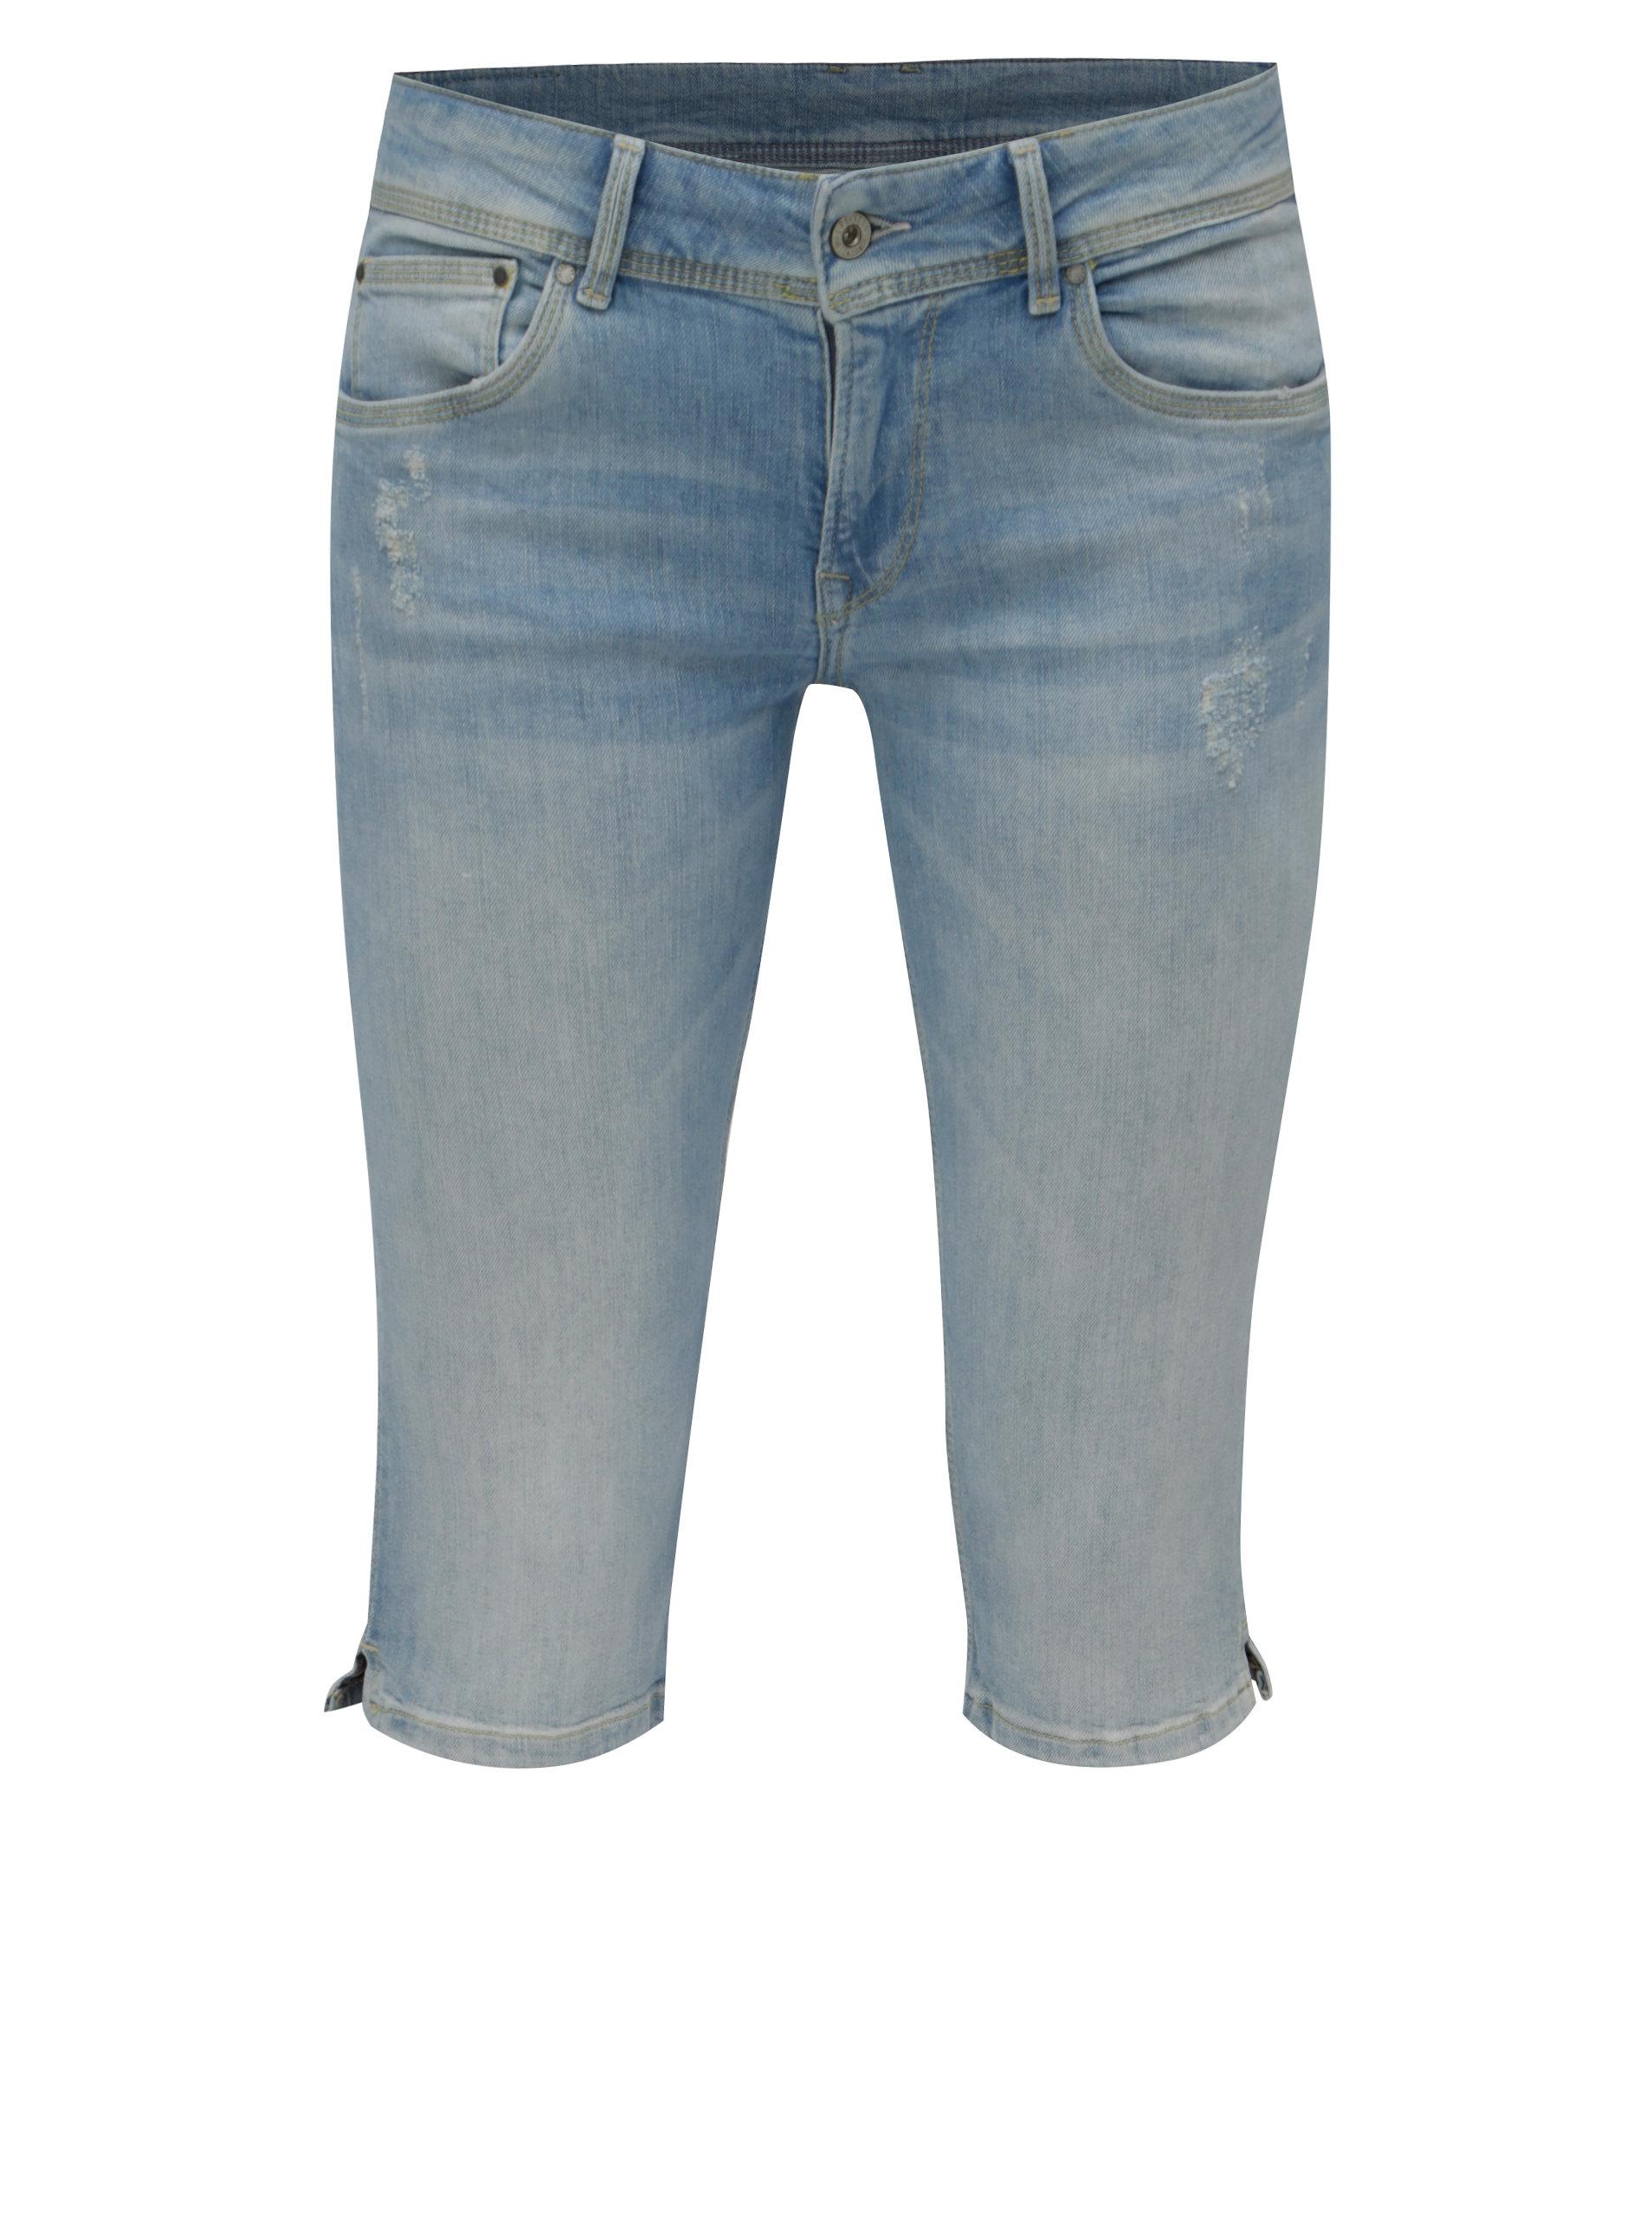 Modré dámské džínové straight kraťasy Pepe Jeans Saturn crop ... e165920e05